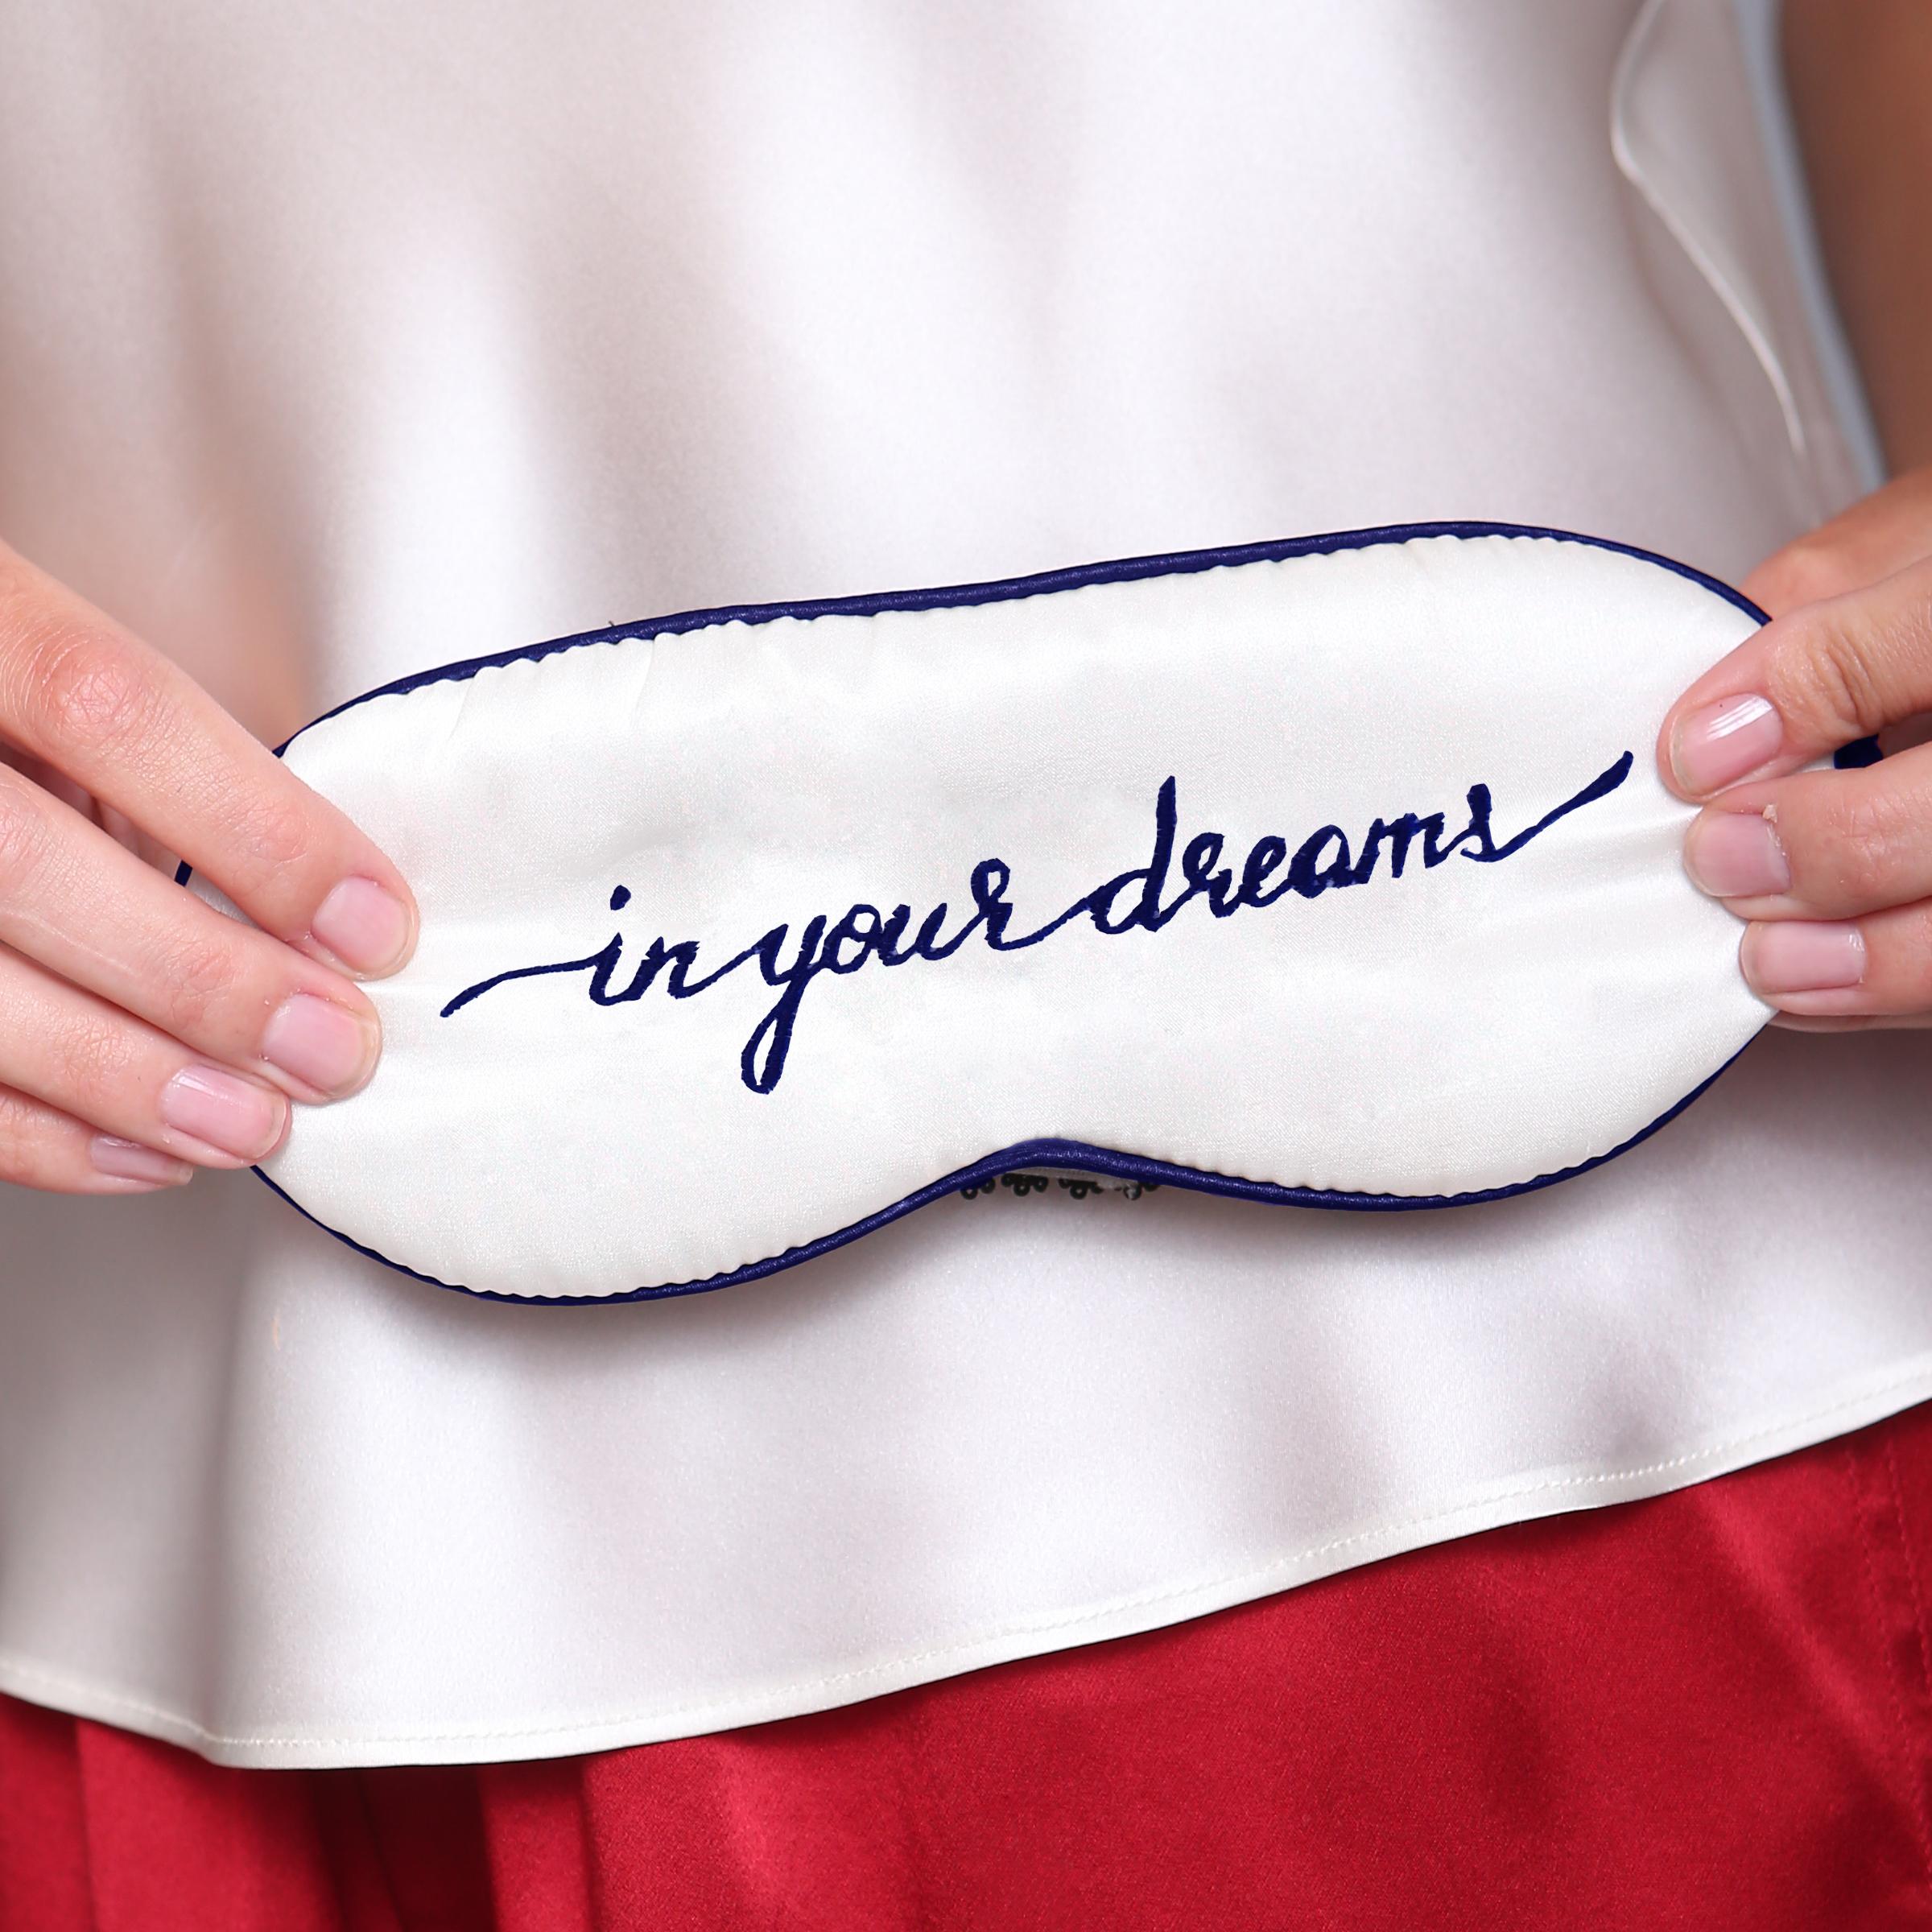 In Your Dreams.jpg